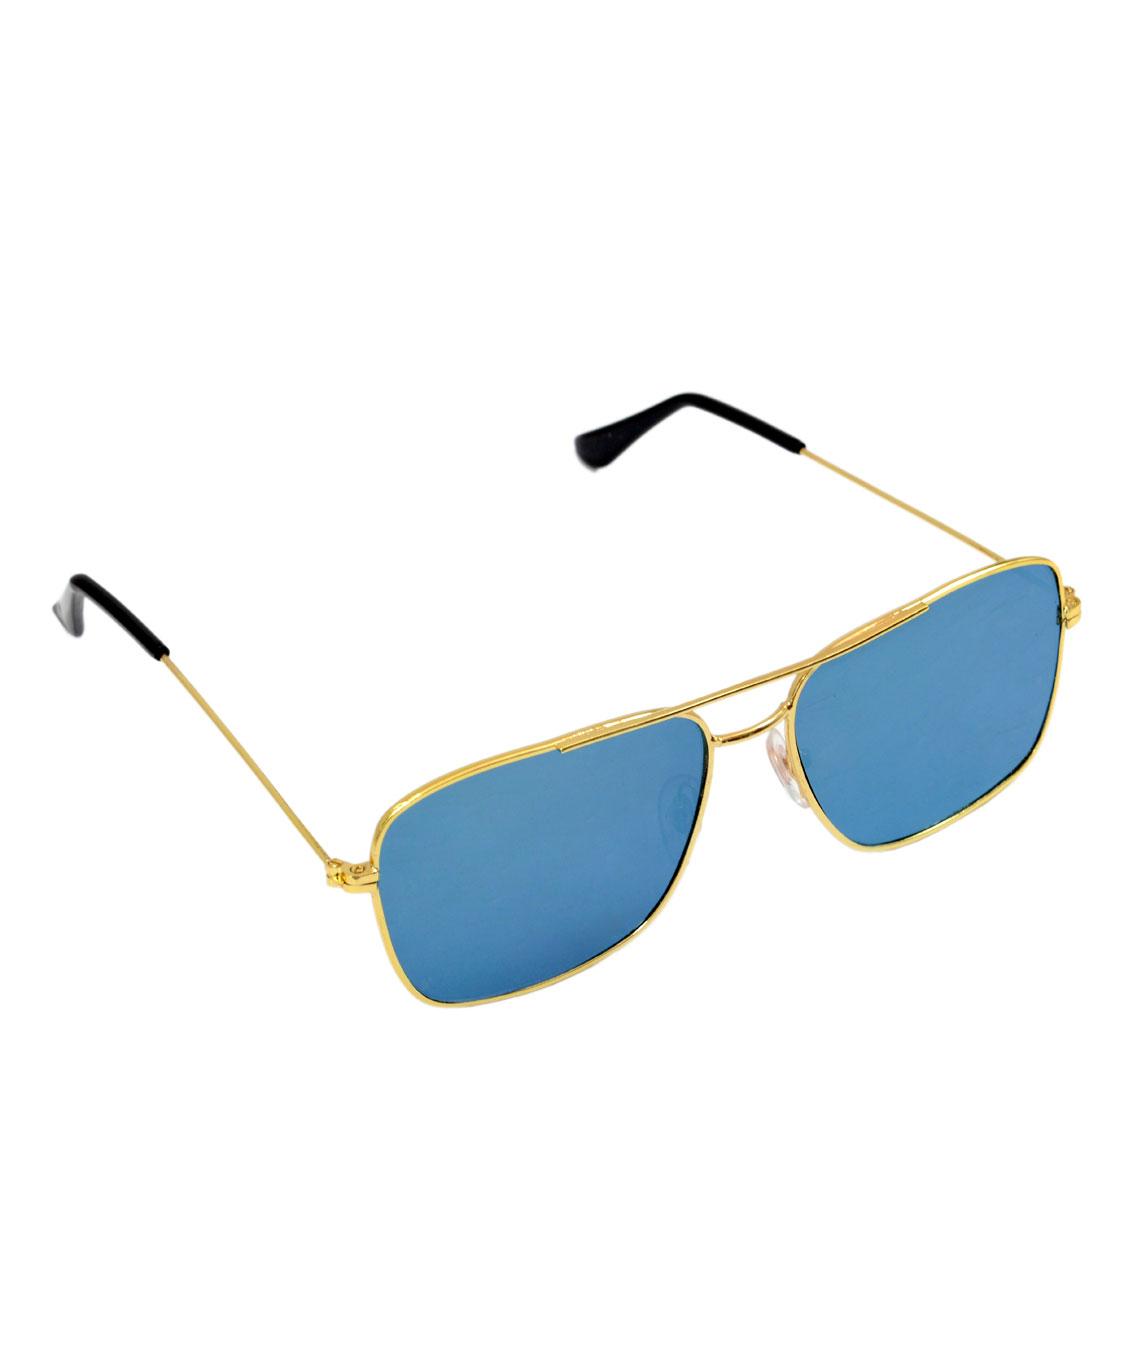 BLUE GOLDEN RECTANGLE